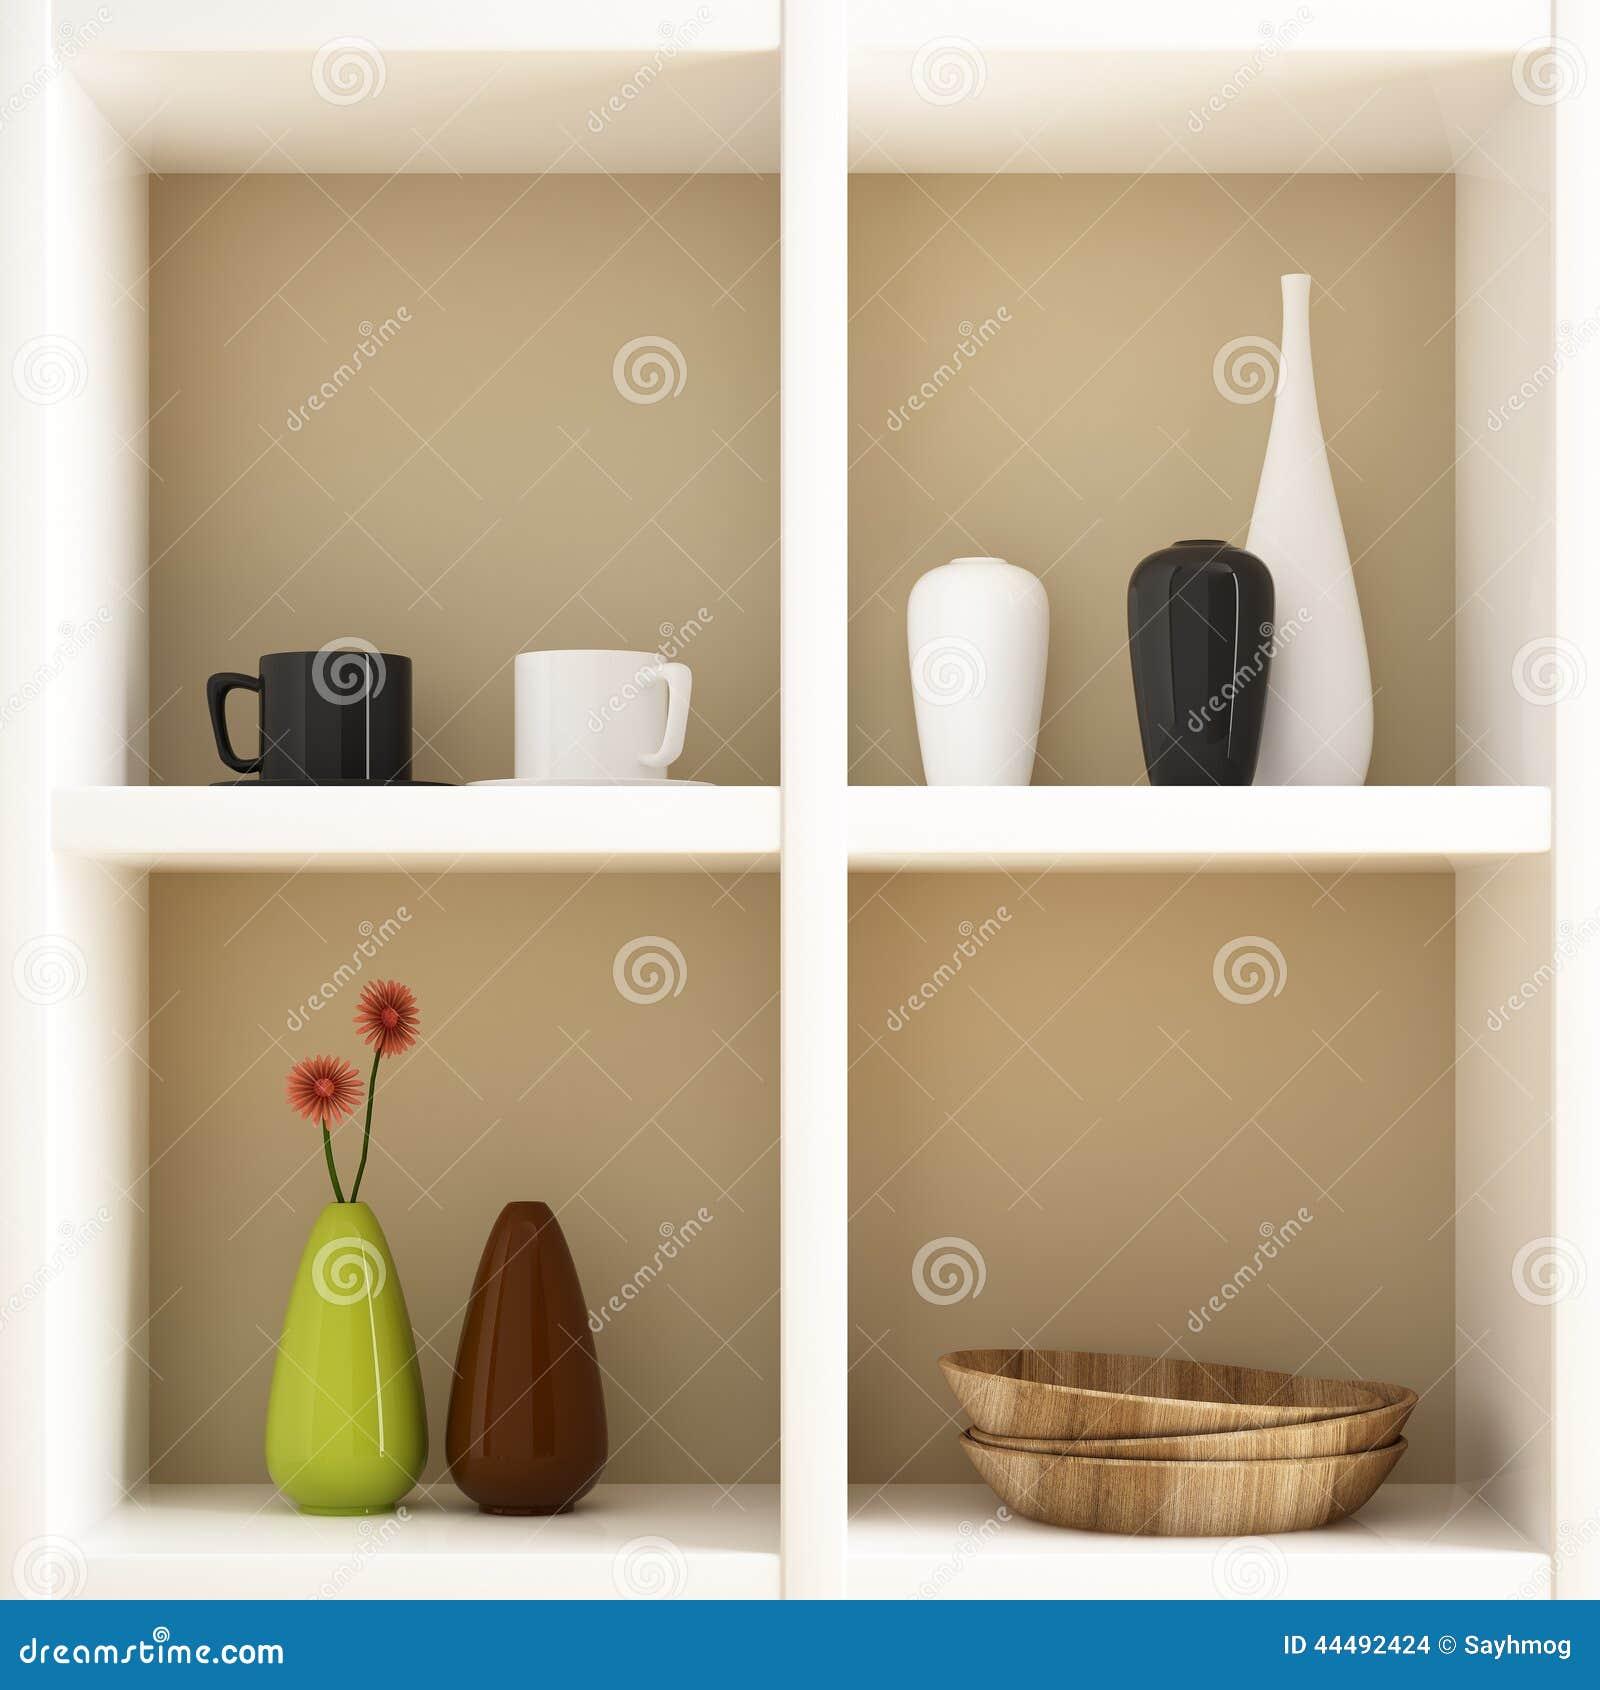 Object on white shelf